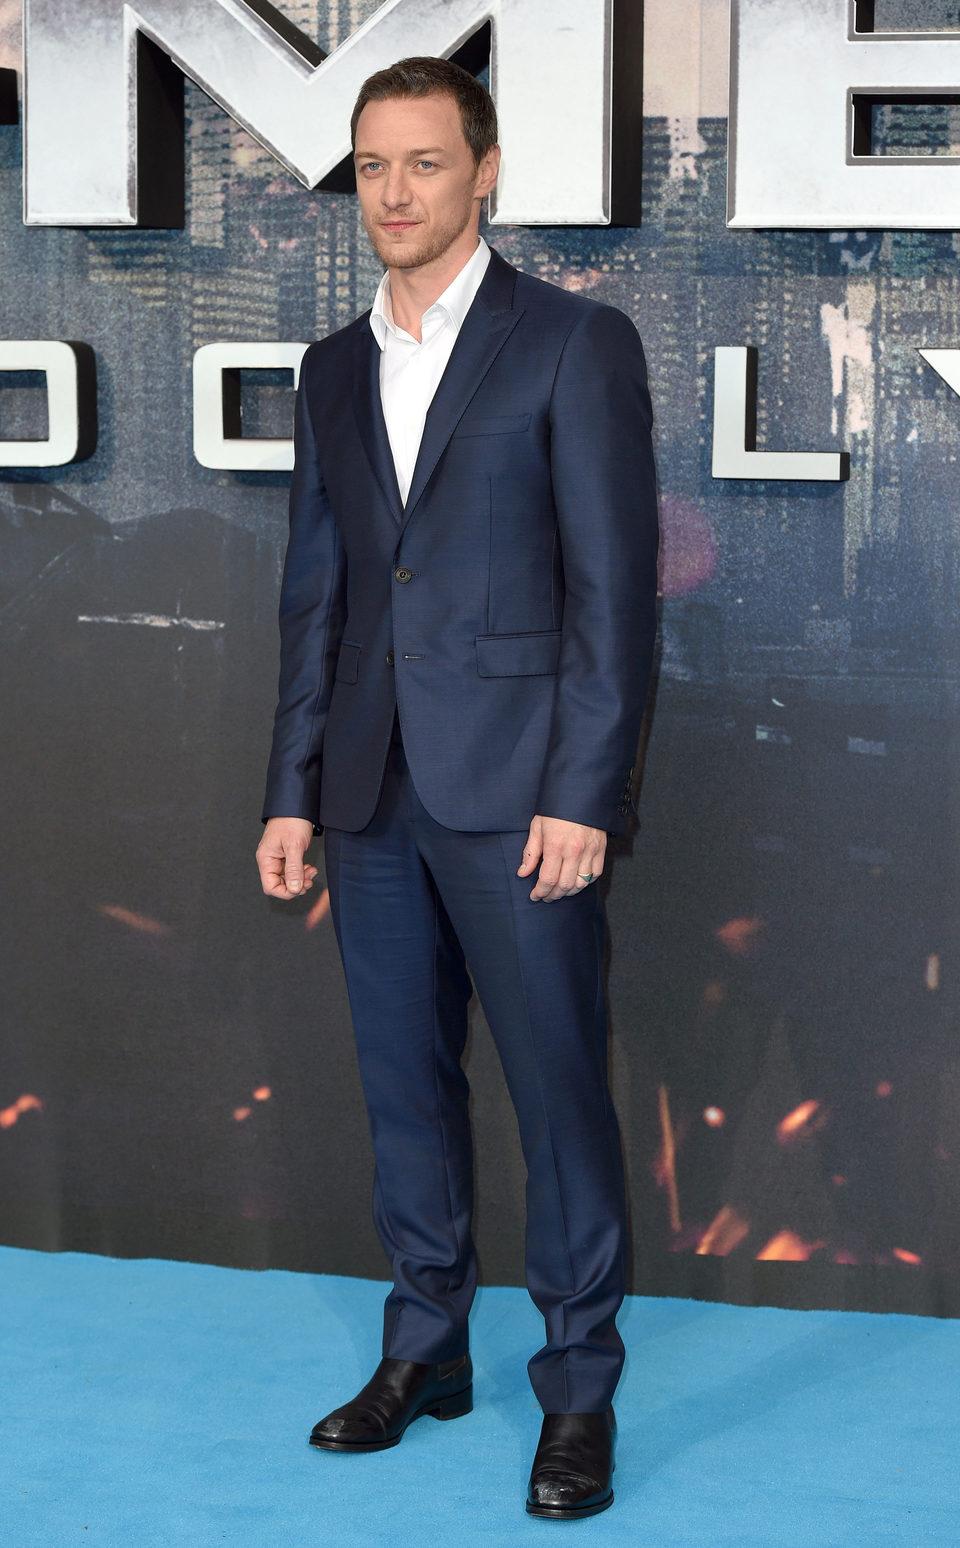 James McAvoy at the 'X-Men: Apocalypse' London premiere